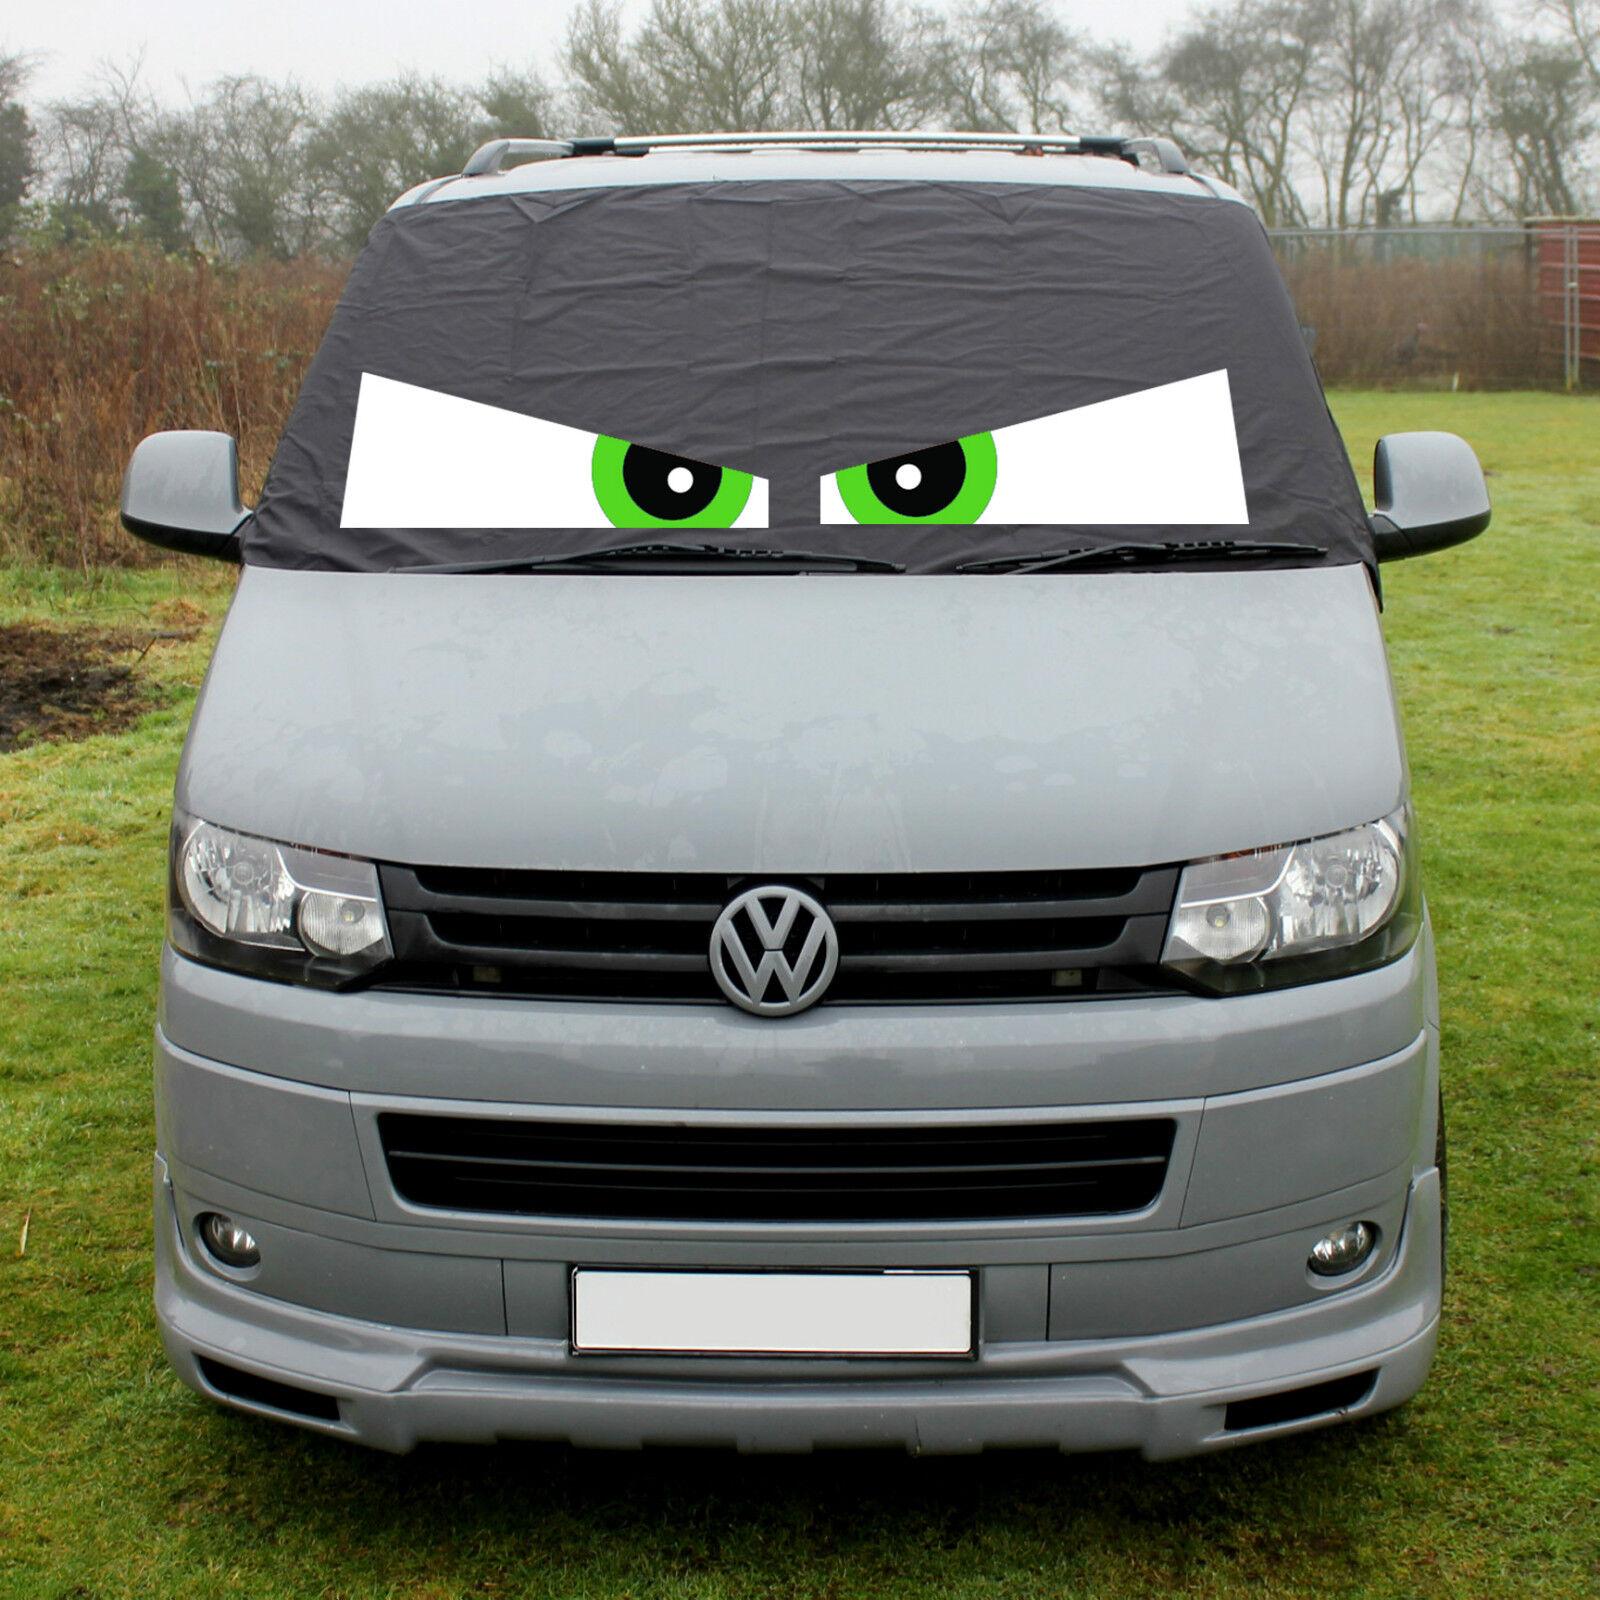 VW Transporter T5 Fenster Displayschutzfolie Vorhang Bezüge Frost Blinde Augen